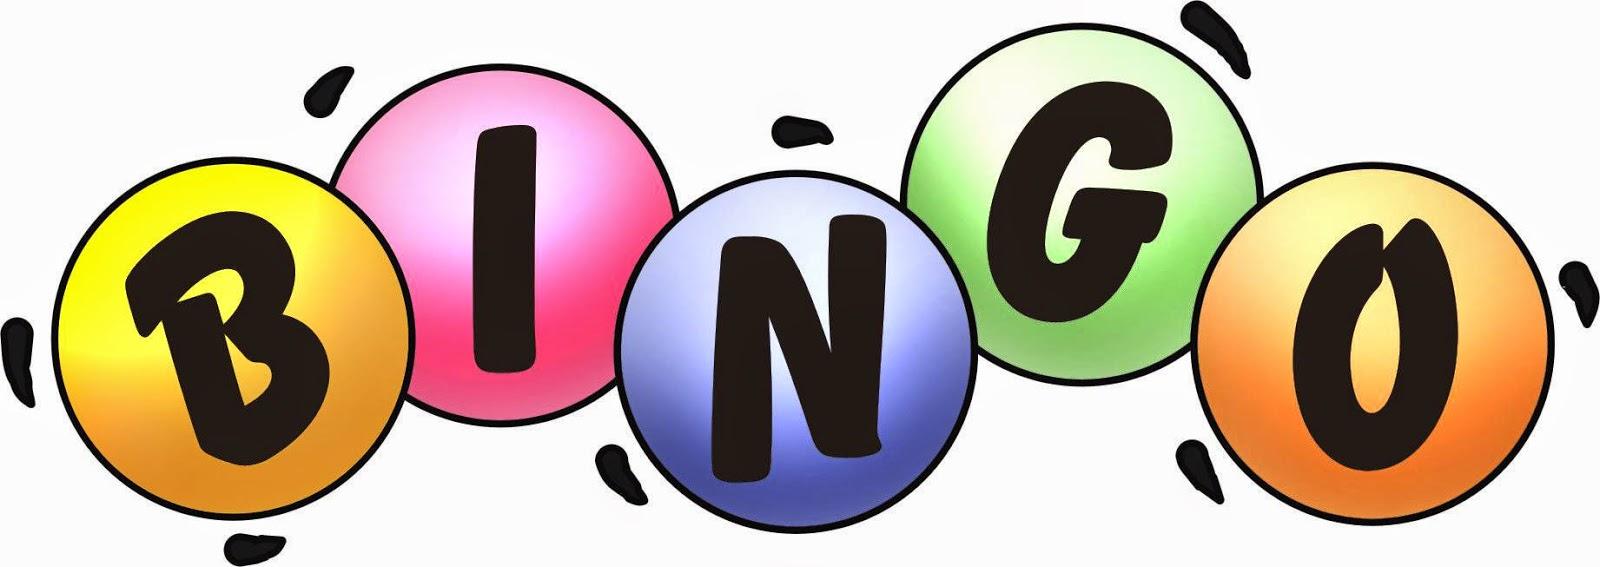 1600x567 Bingo Night Is Friday, January 12